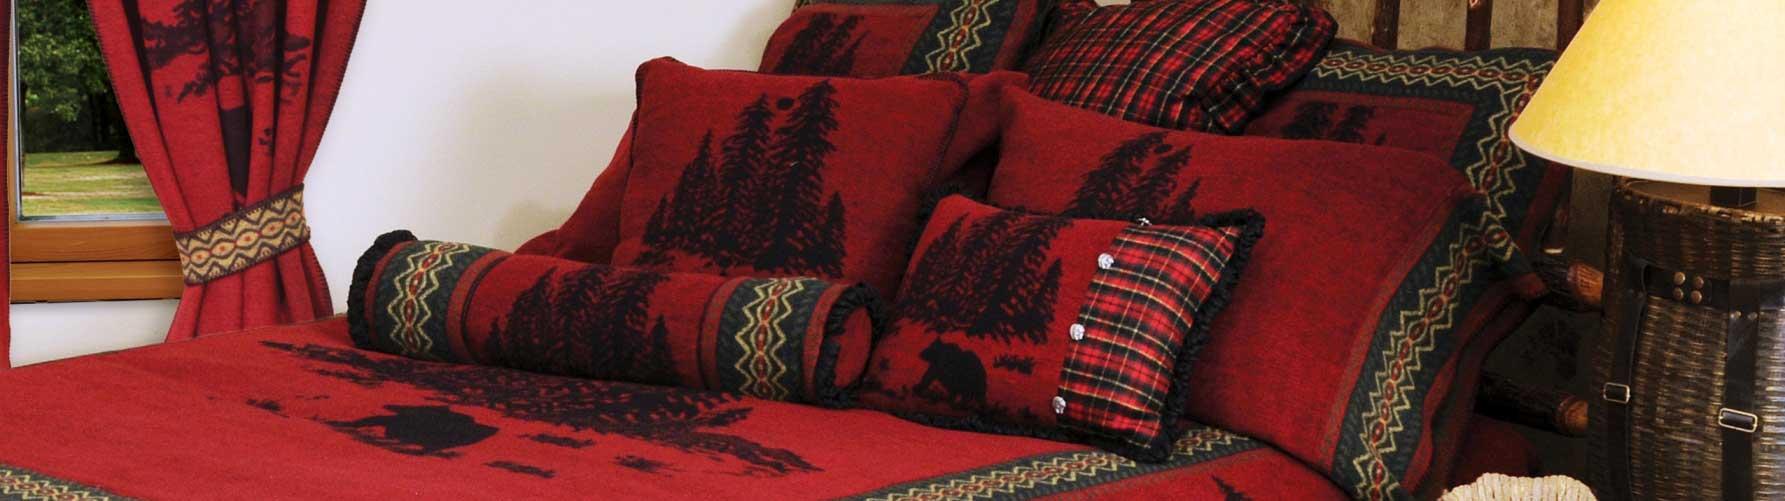 wooded-bear-bedding